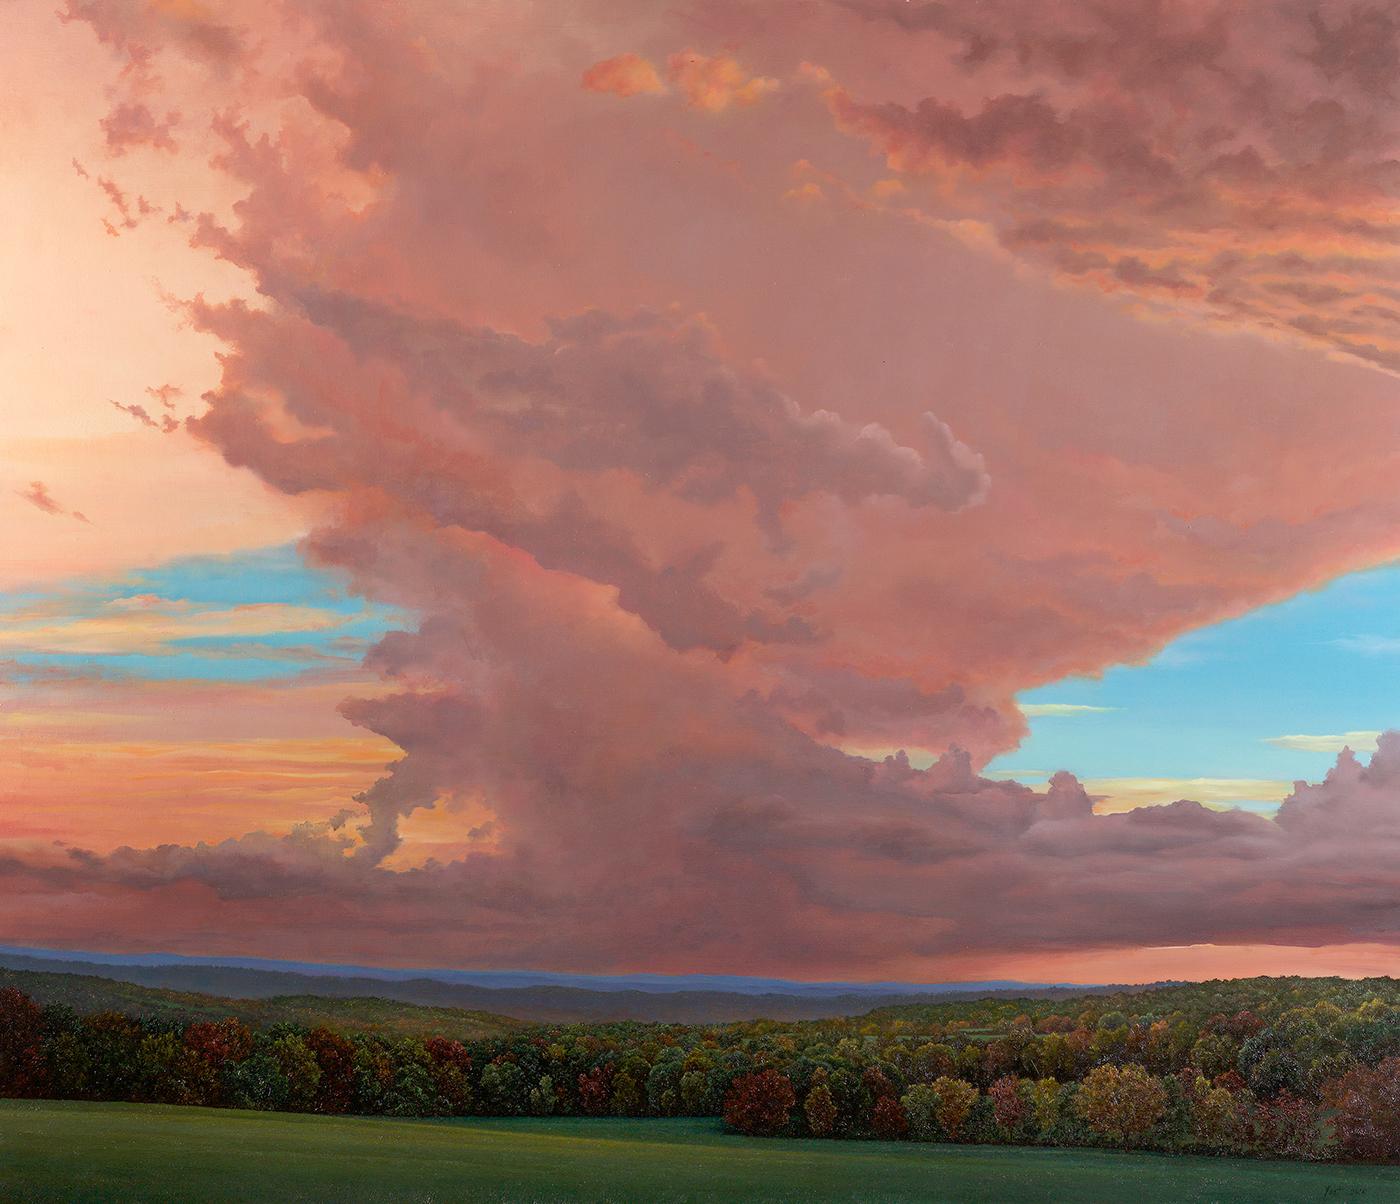 Yost-Storm Approaching Painter Ridge, 2016